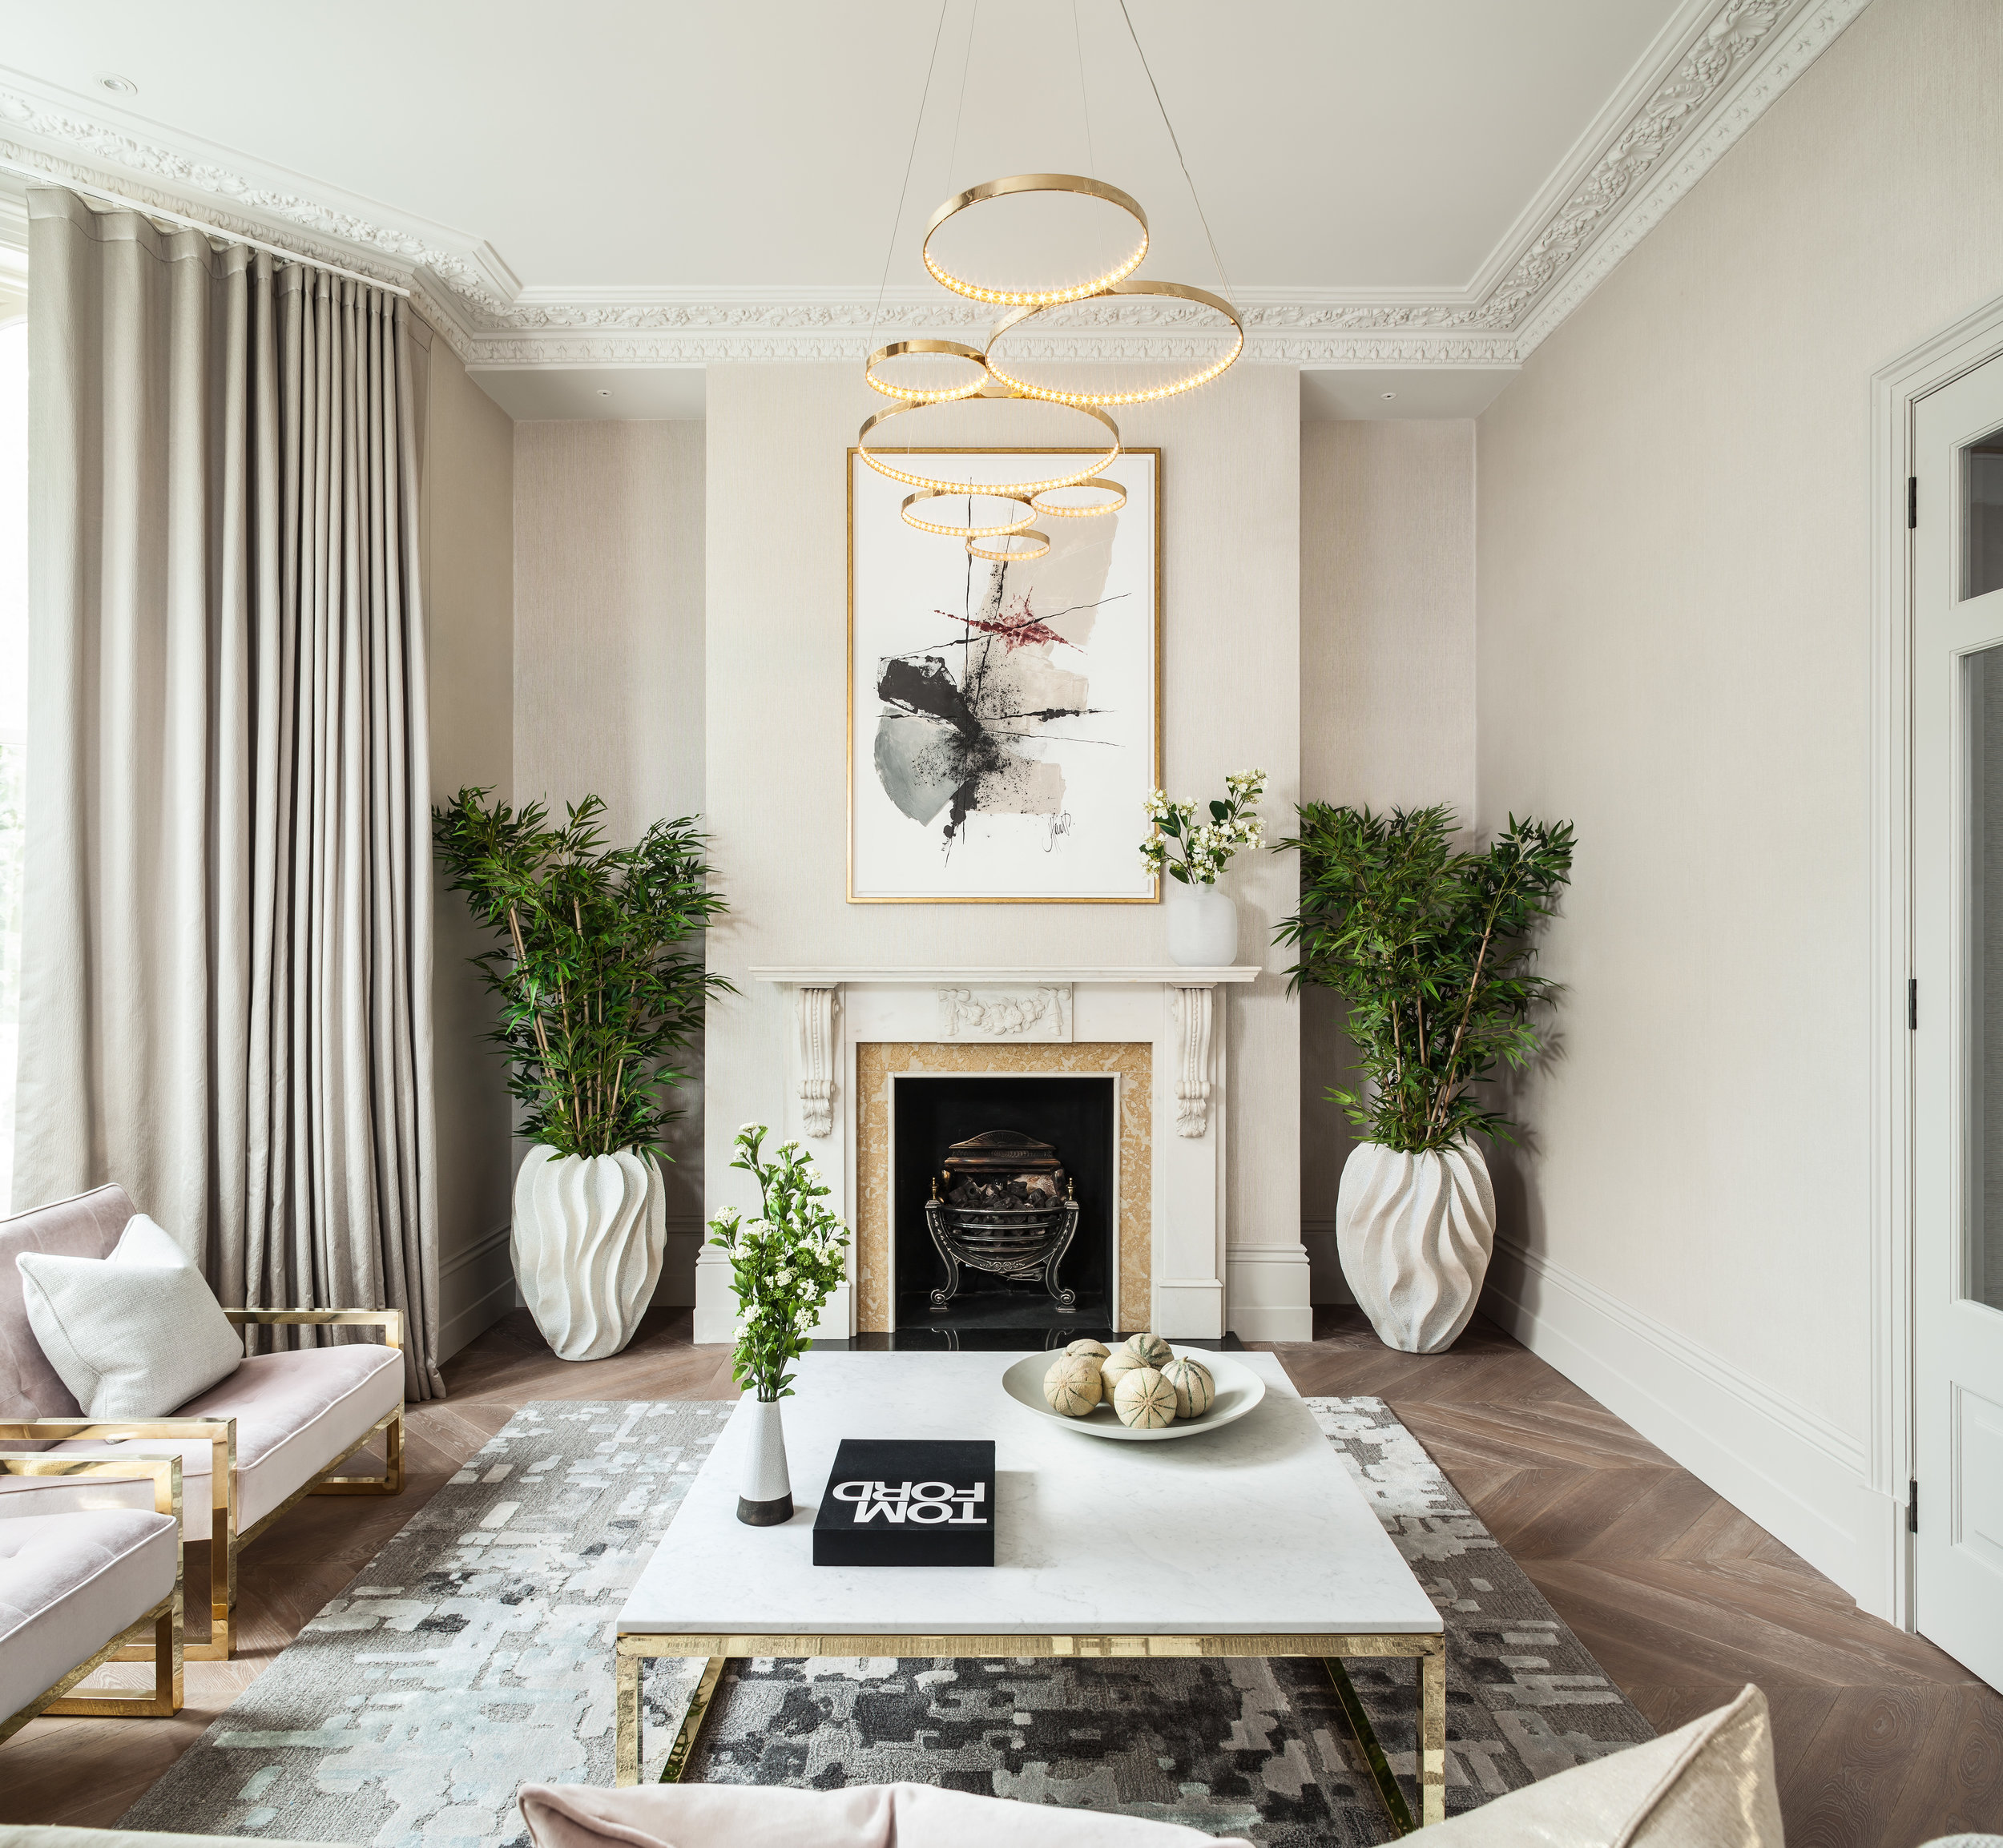 Jo Hamilton Interiors - Observatory Gardens, Kensington, lounge and fireplace